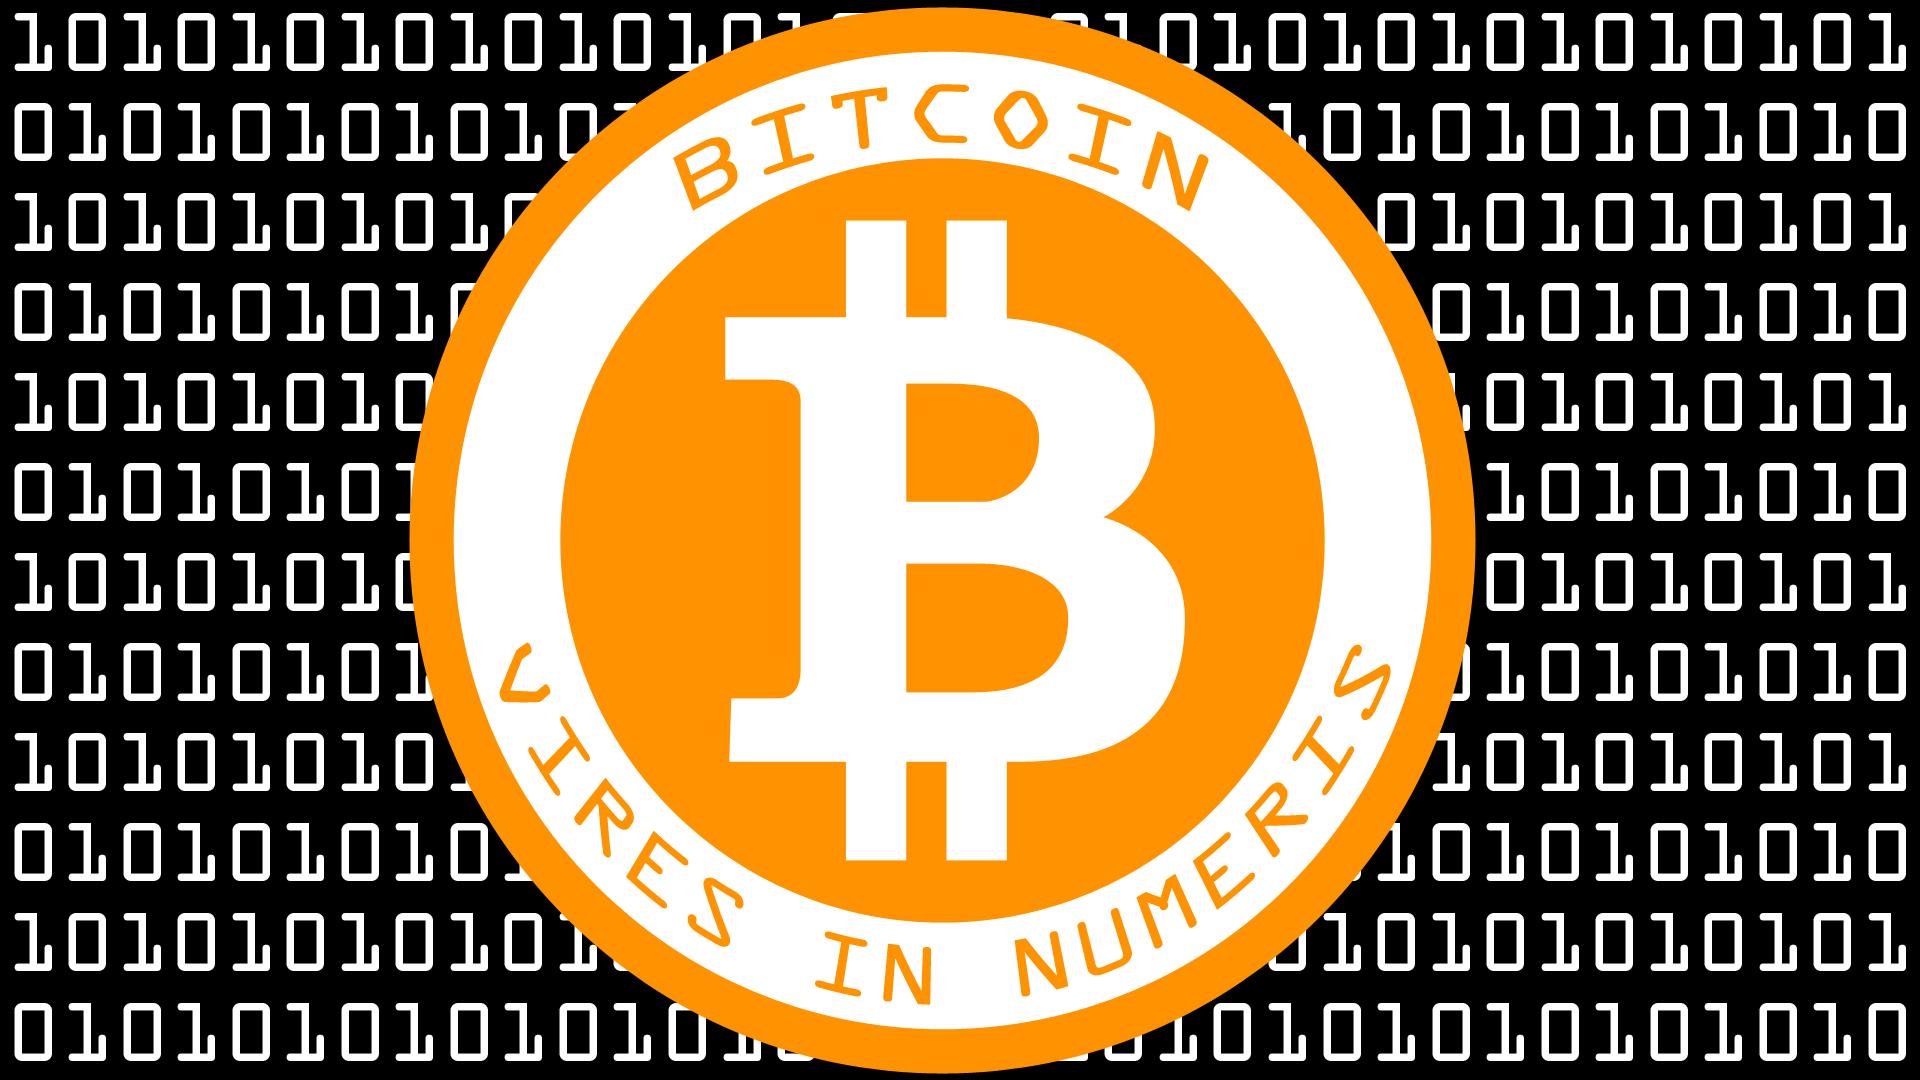 bitcoin image.jpg